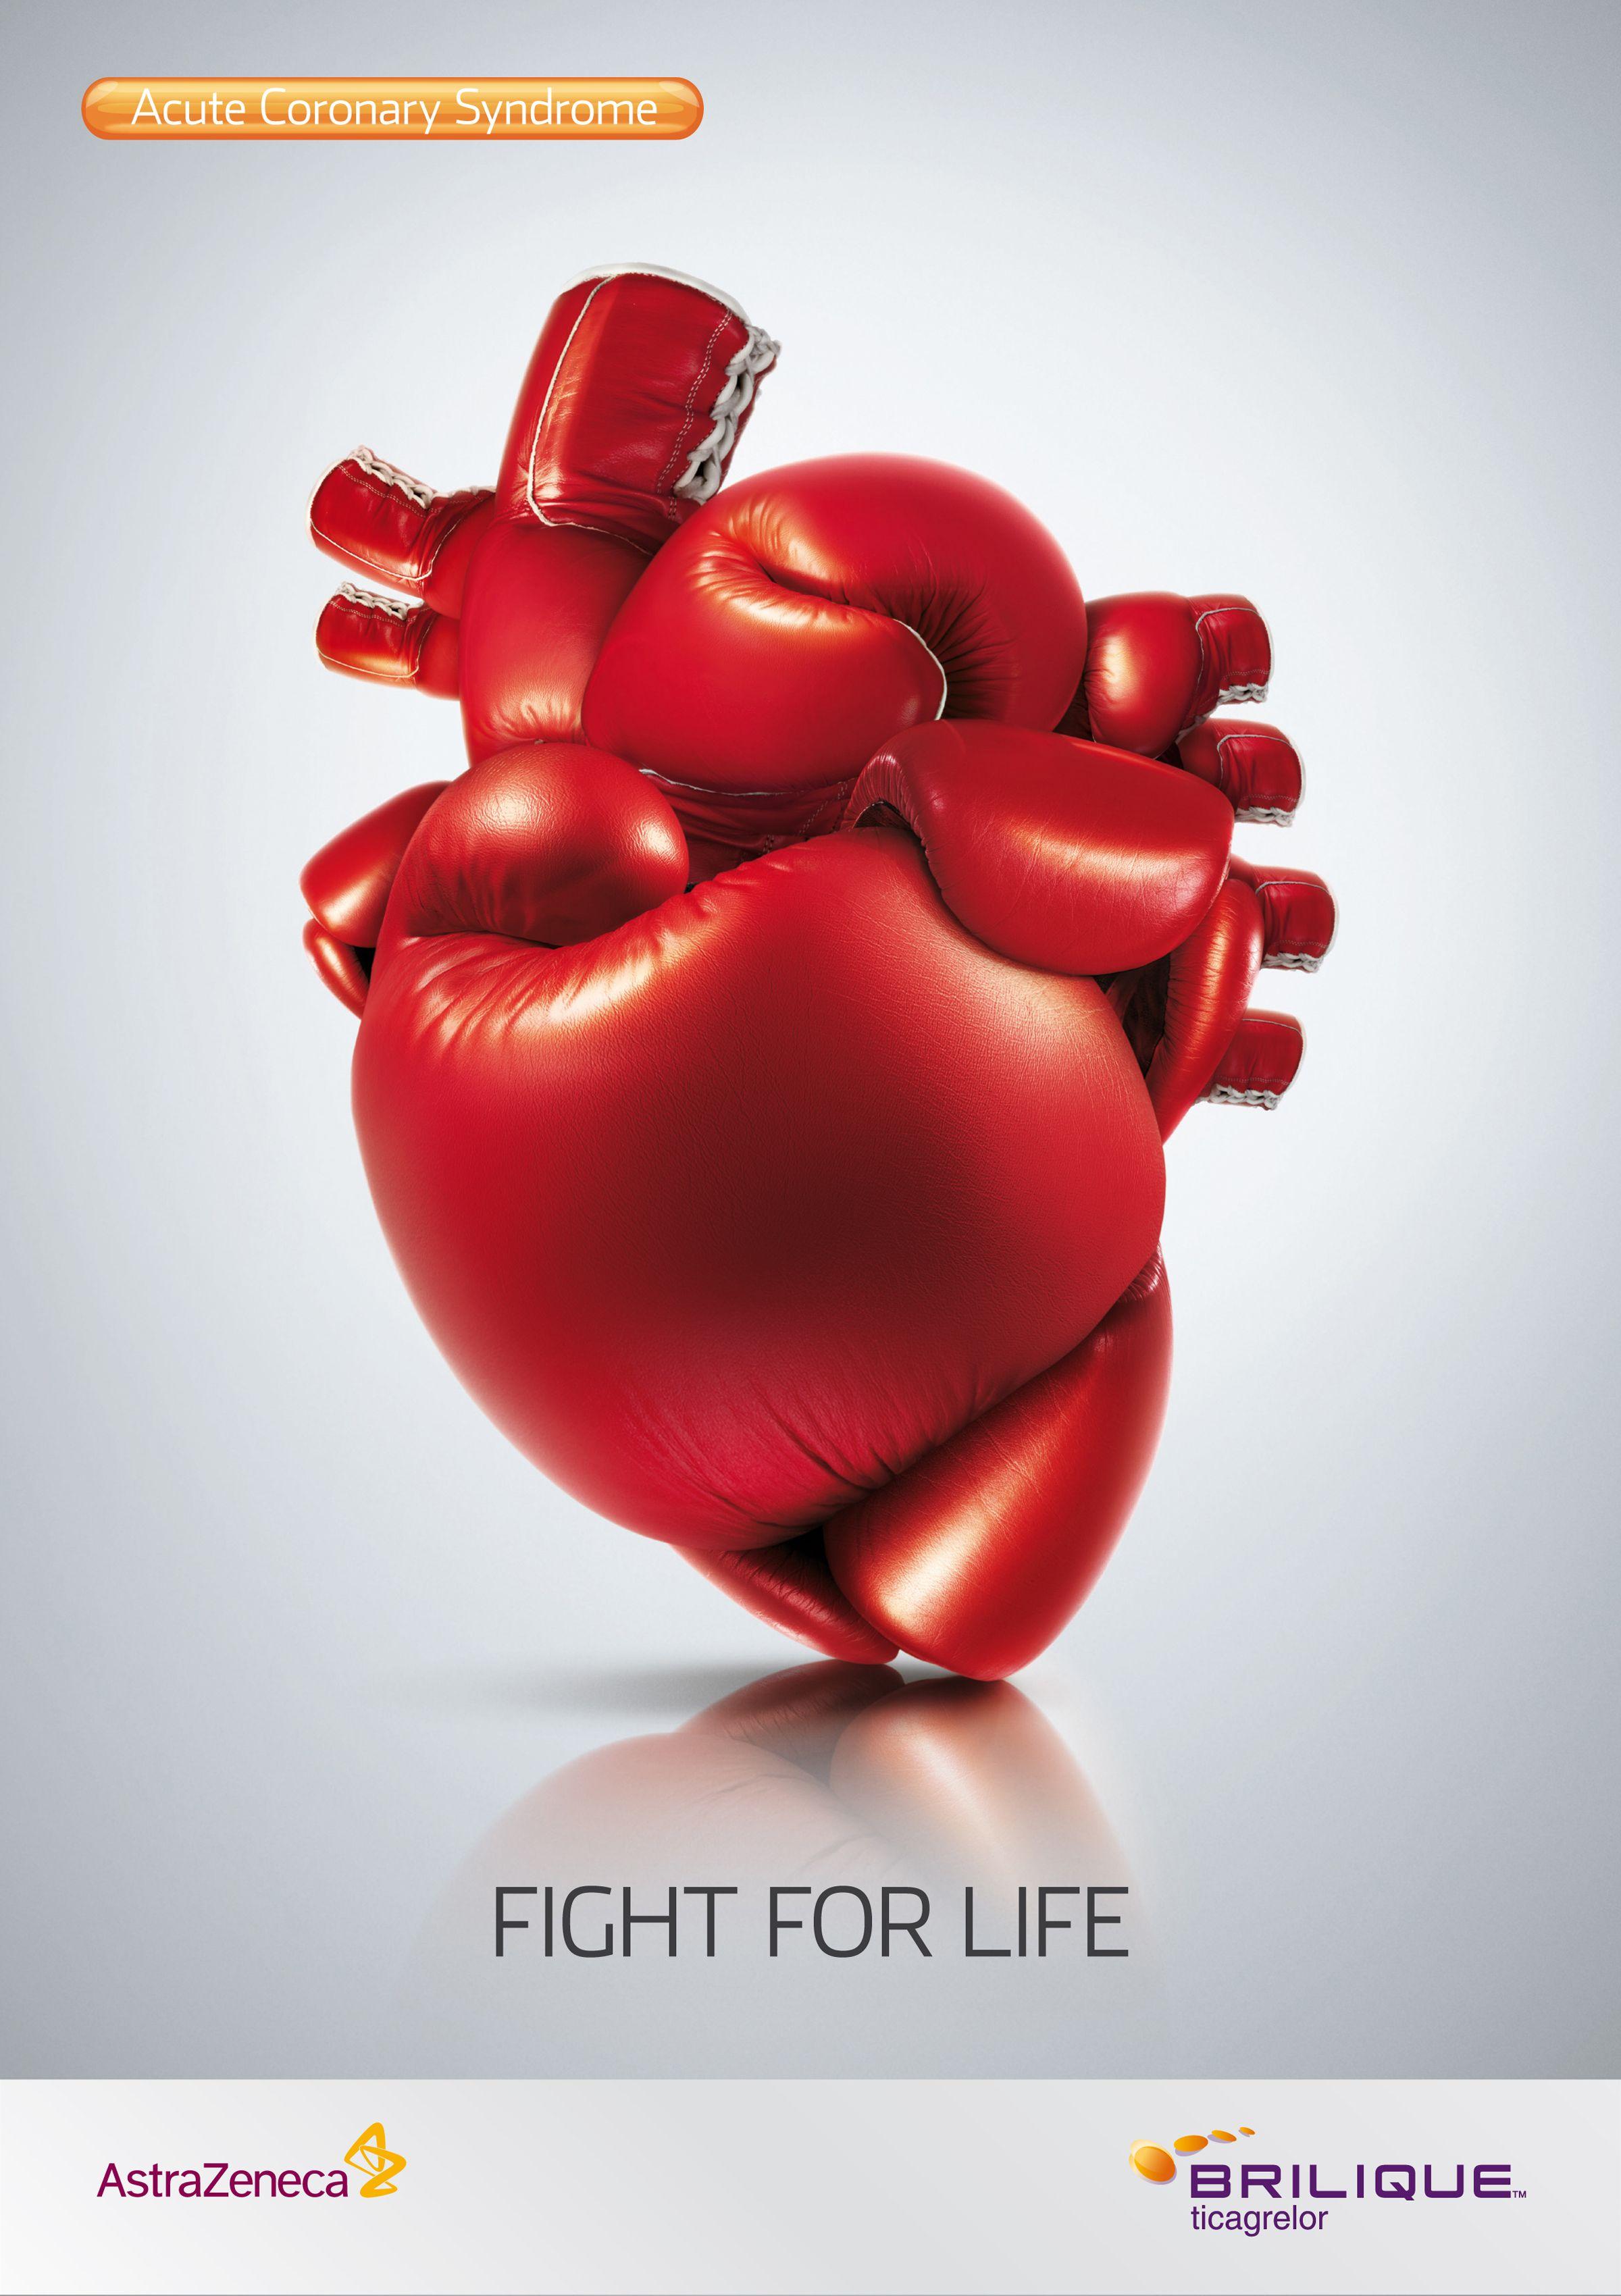 A Global Award Winning 2012 Ipa Best Of Health Awards Print Advertisement For Astrazeneca S Brilique Creative Advertising Healthcare Advertising Ads Creative